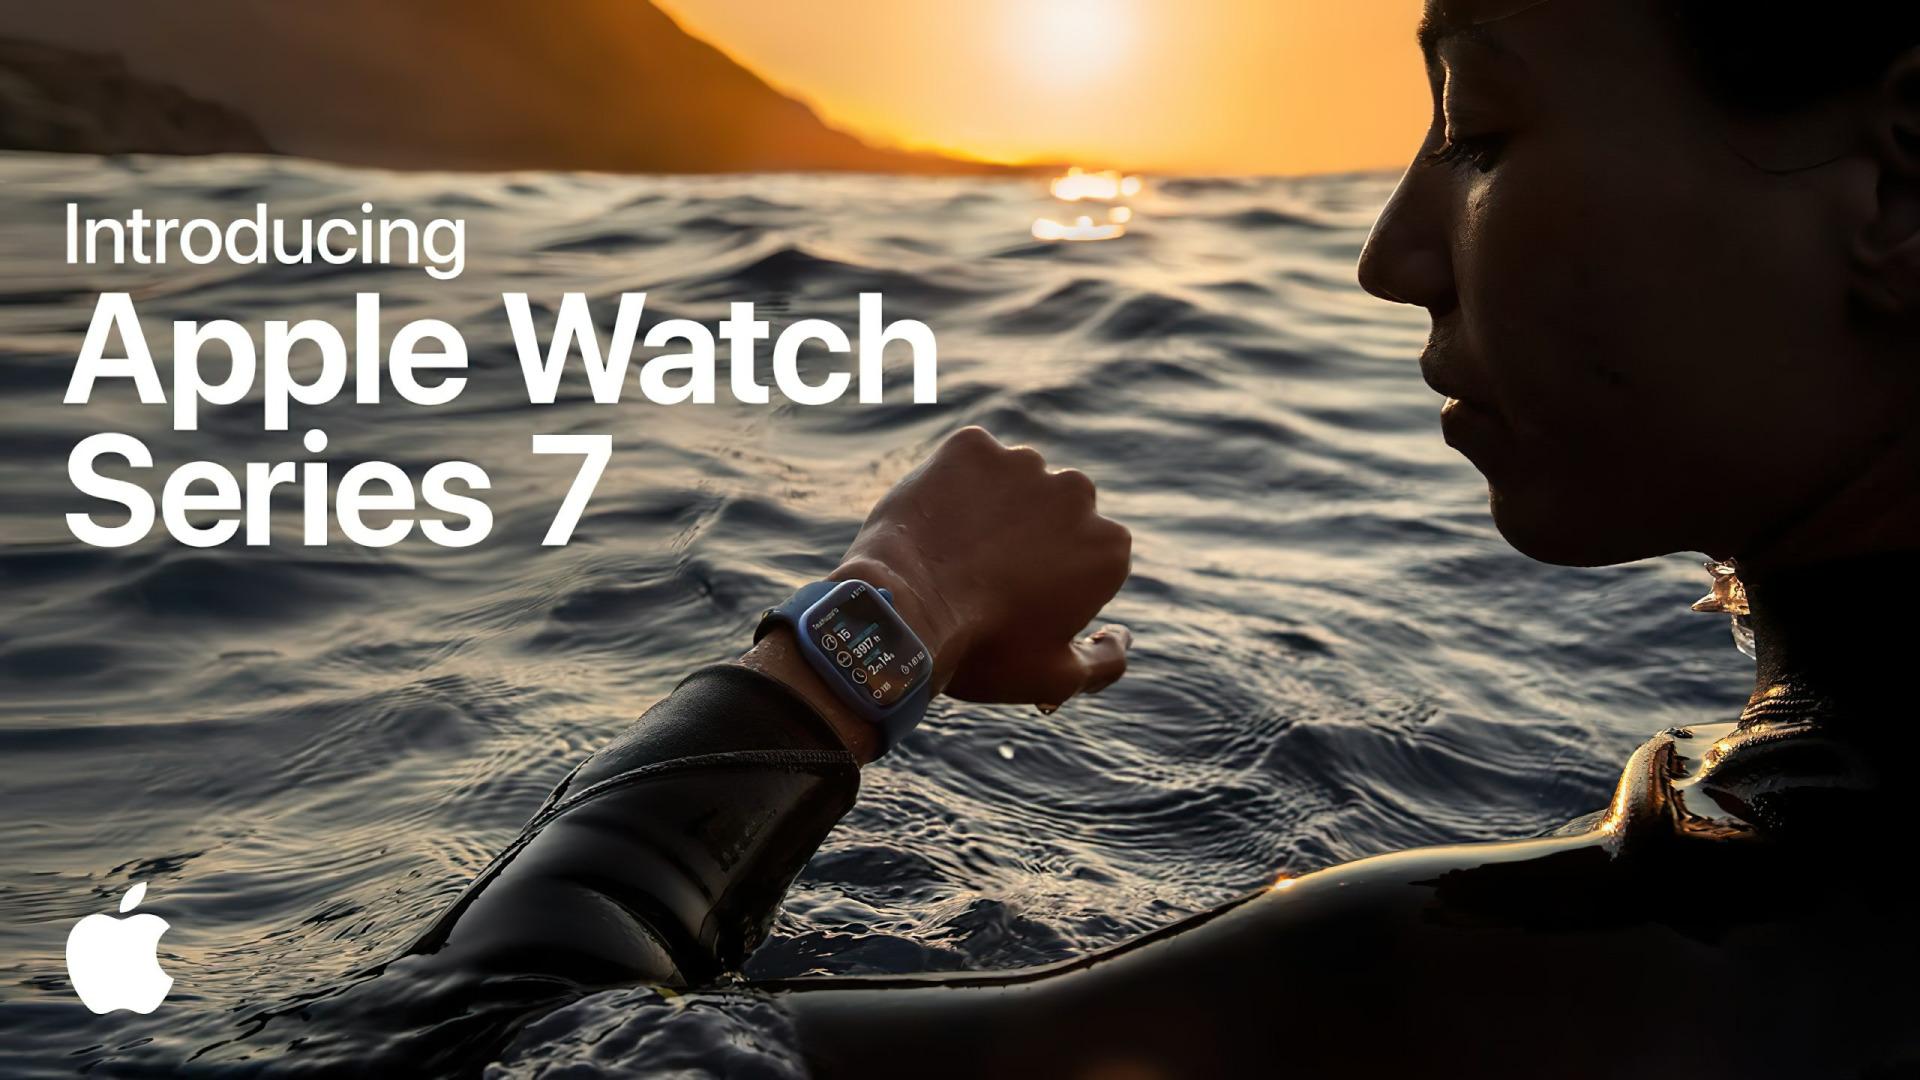 Apple, smartwatch, Werbespot, Uhr, Wearables, Apple Watch, Armbanduhr, Apple Watch Series 7